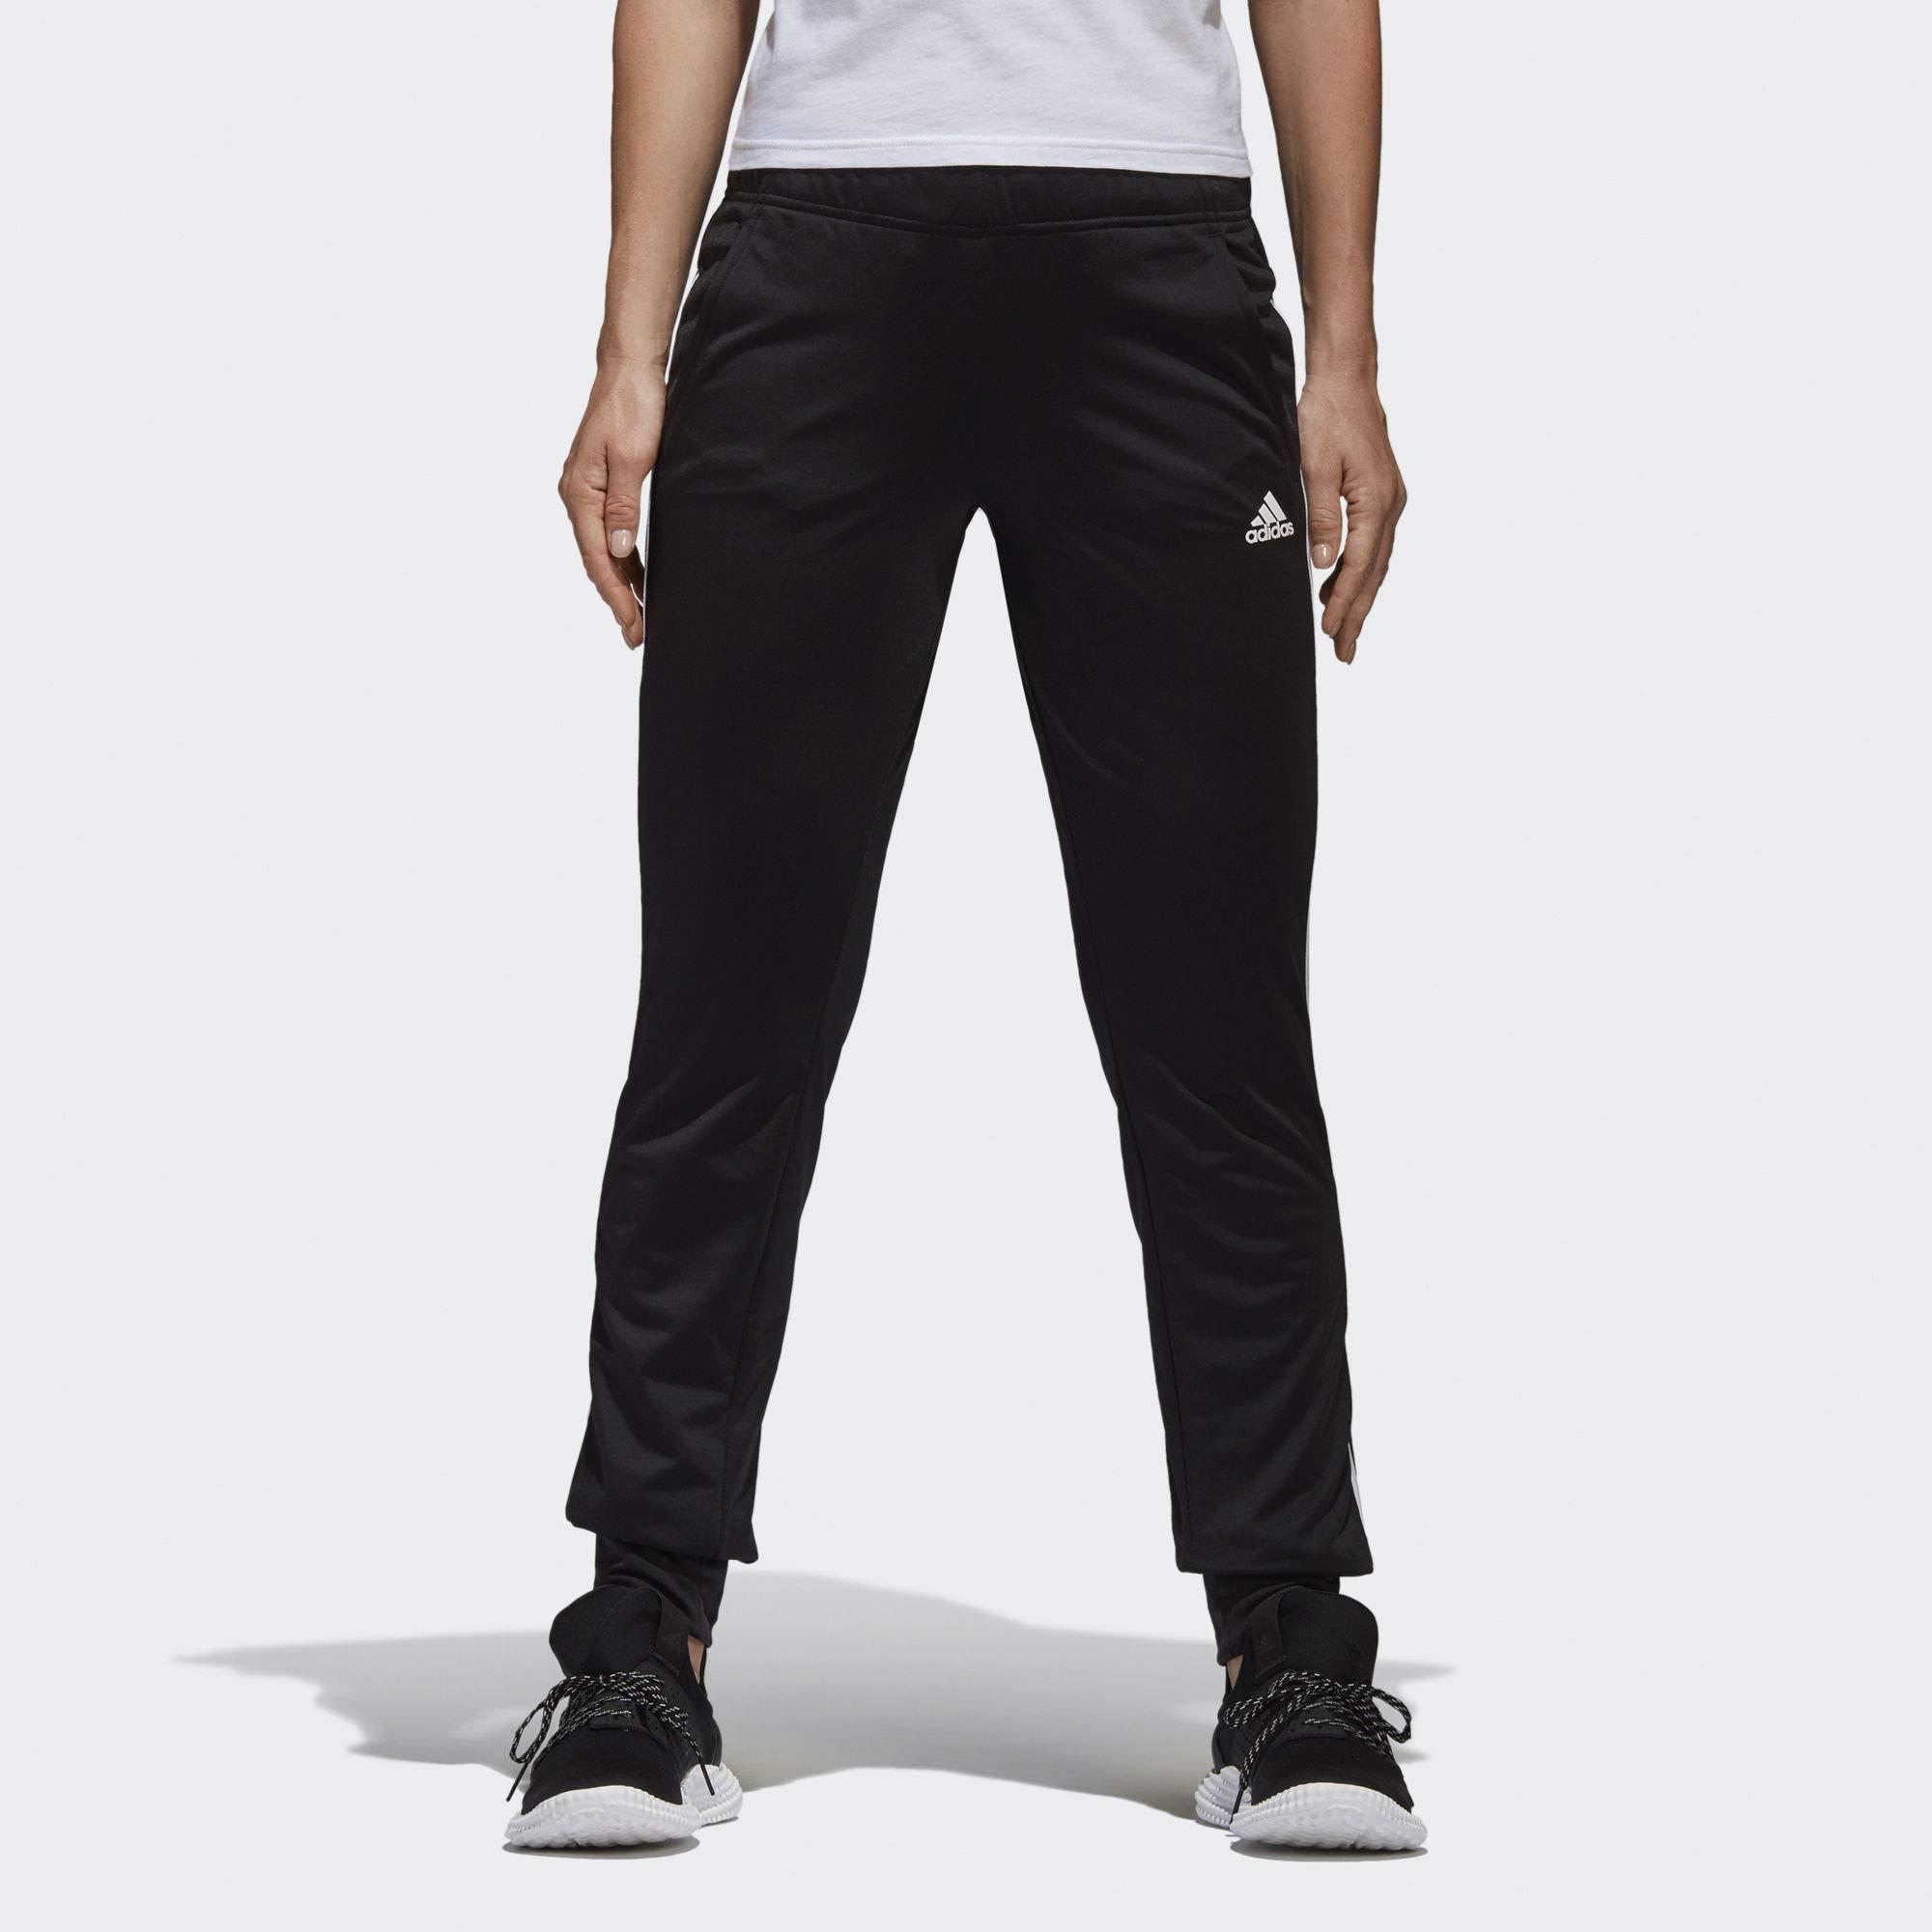 87c3256960c5f adidas Women's Designed 2 Move Cuff Pants